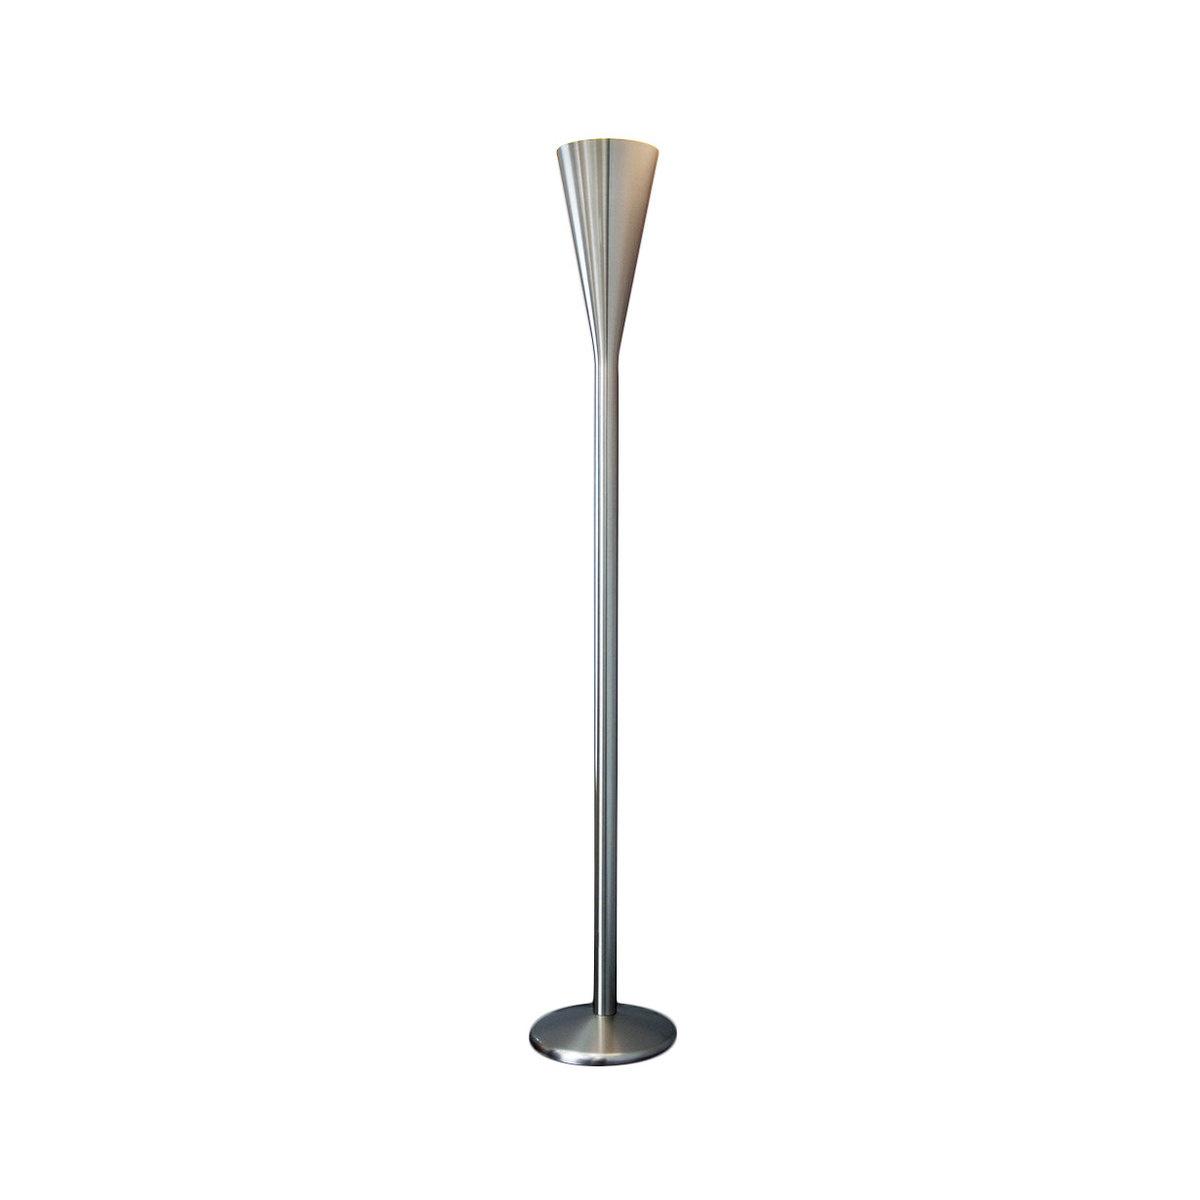 Lampada da terra luminator h 184 by fontanaarte lovethesign for Lampada luminator